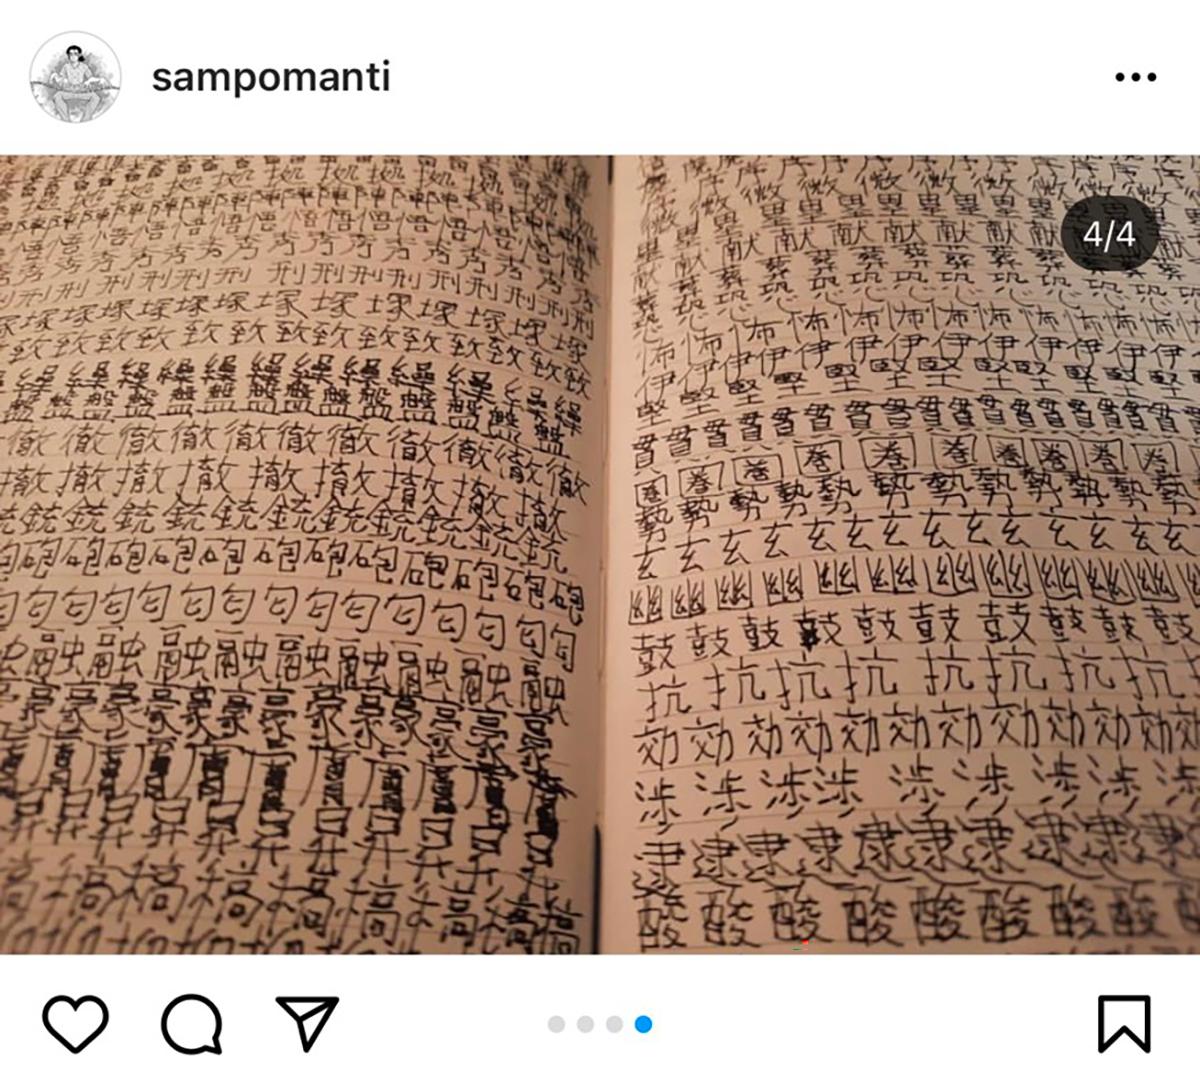 B'zサポートメンバー・サム・ポマンティが漢字を練習したノートの写真